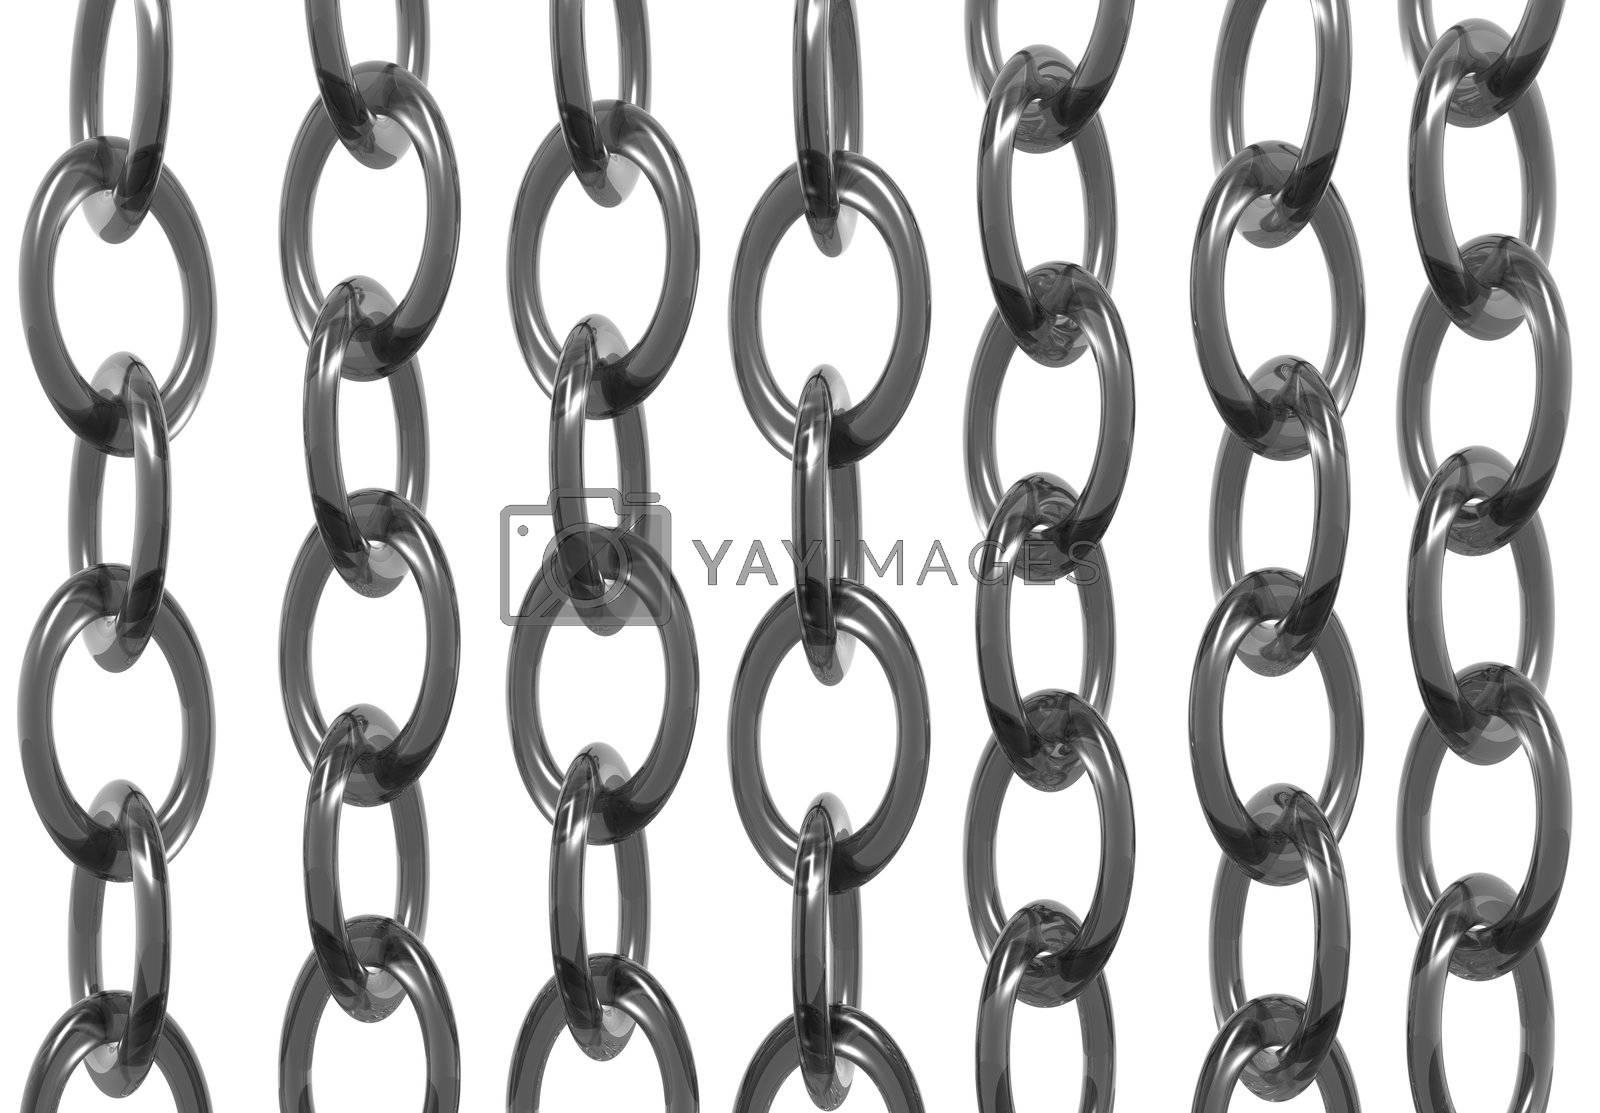 chains on white background - 3d illustration